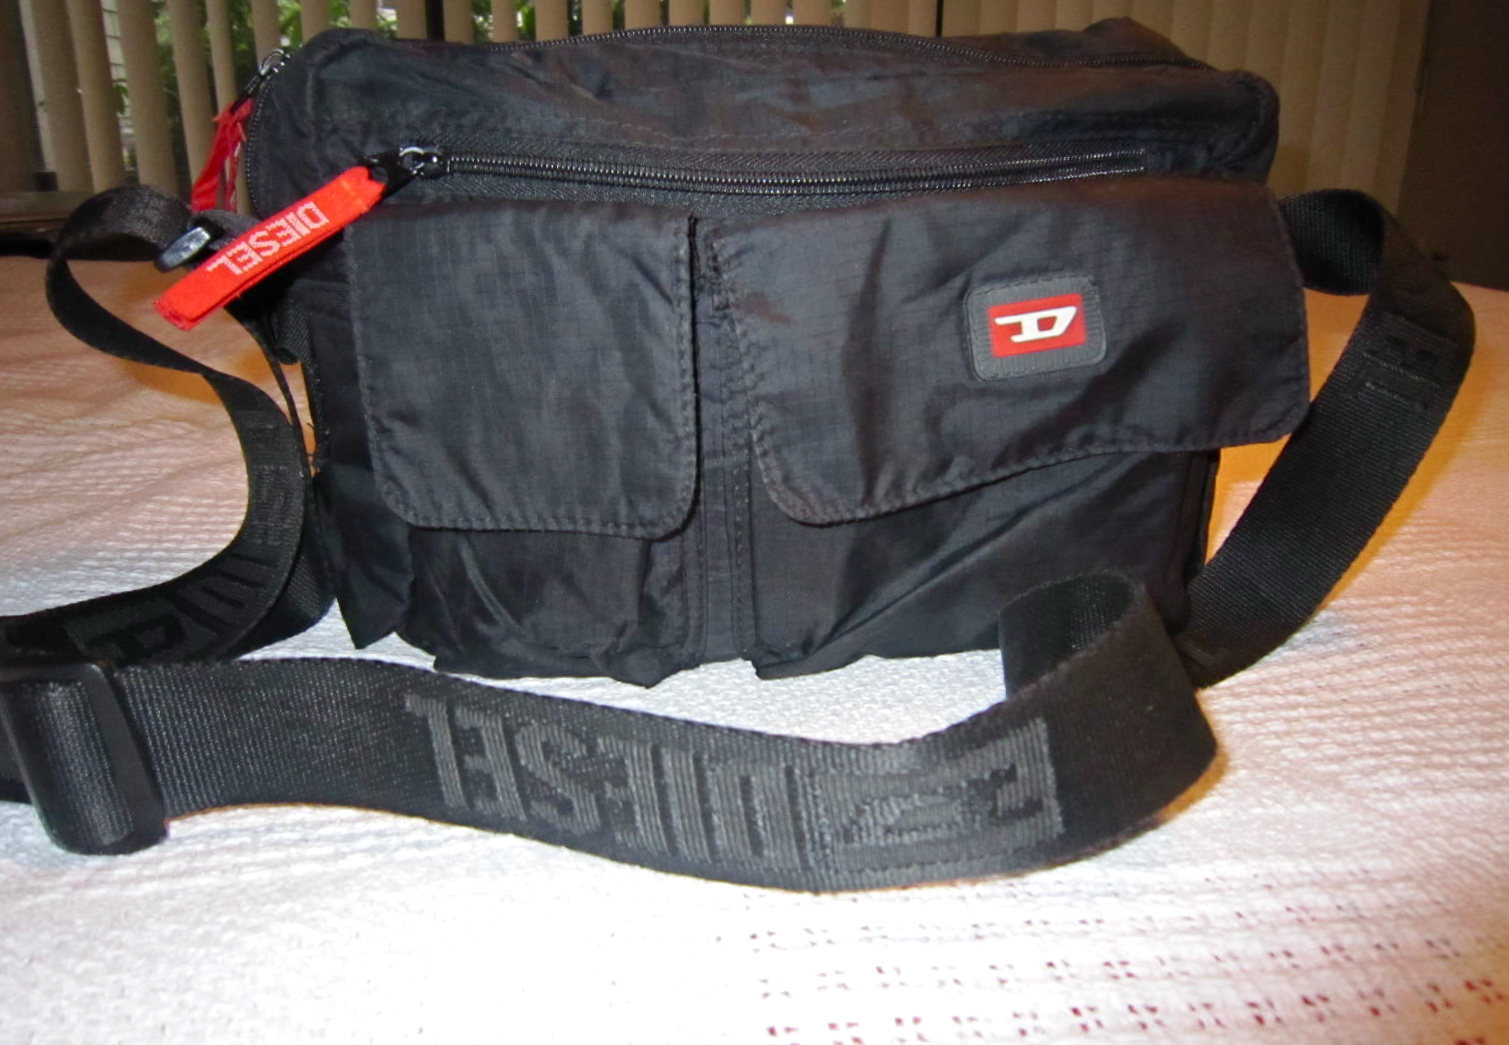 f09f0983f Diesel Messenger Bag - Luxurylana Boutique